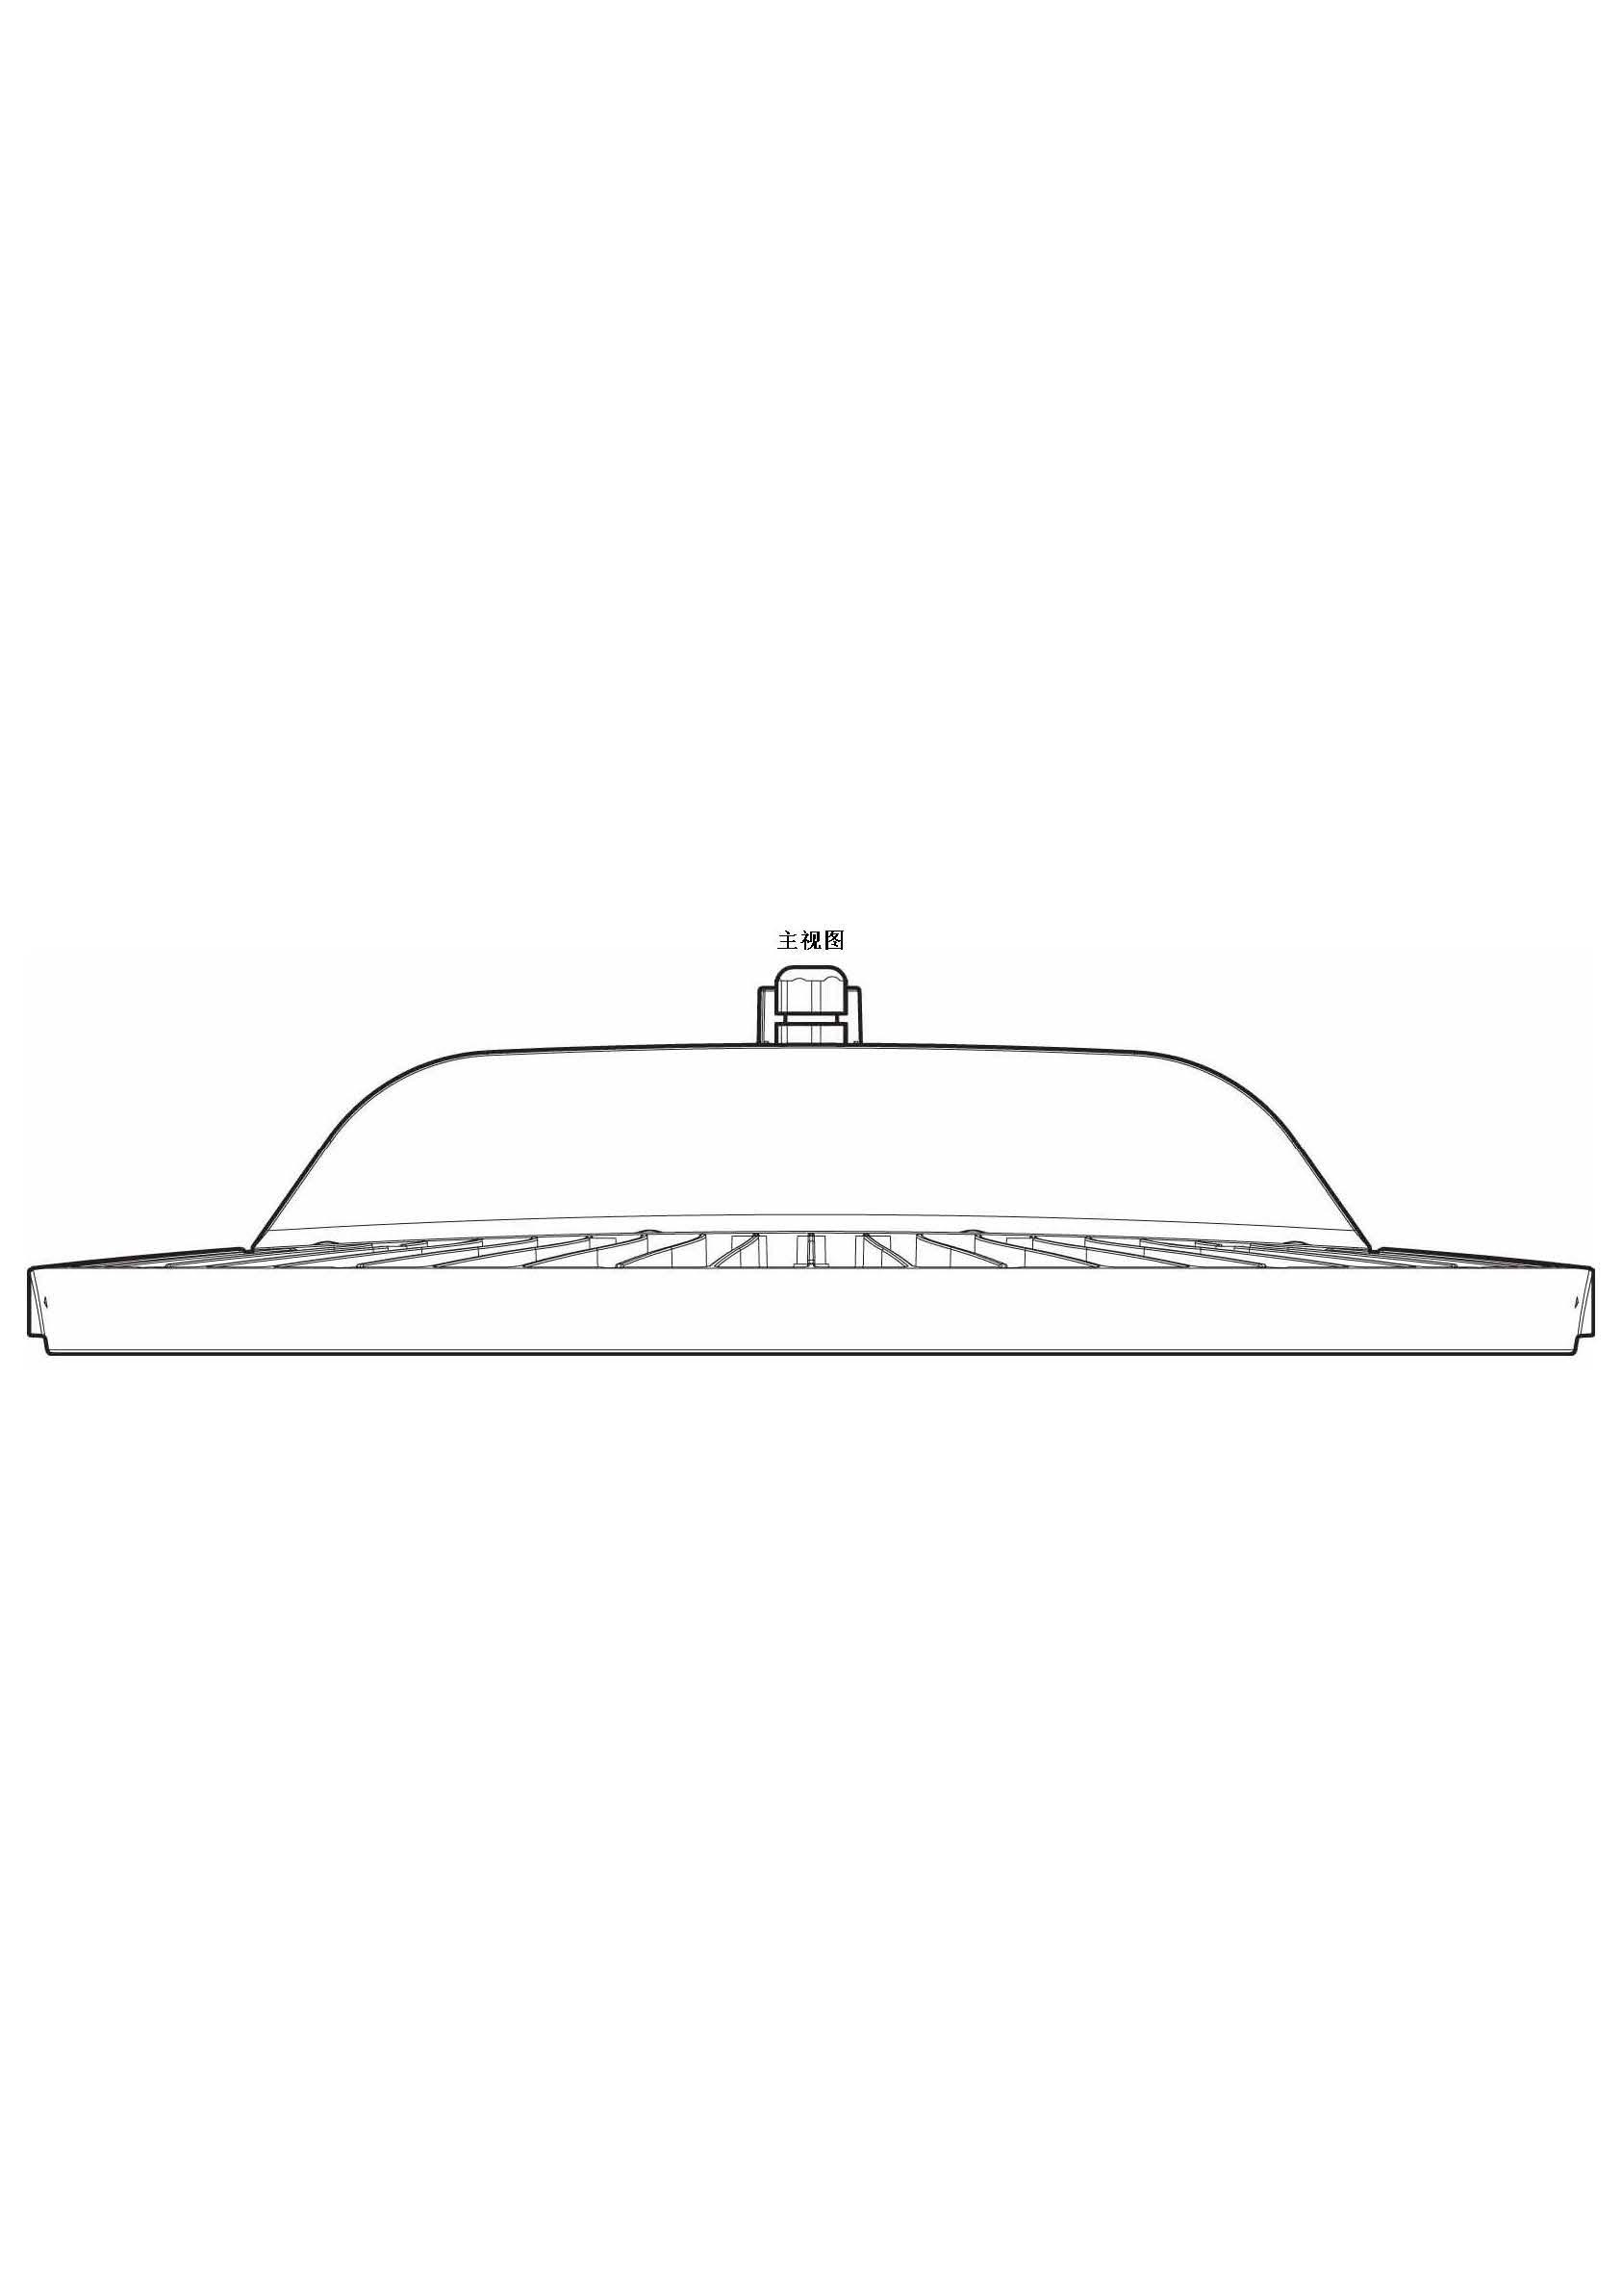 CN201630209928-LED高天棚燈-外觀專利_頁面_3.jpg